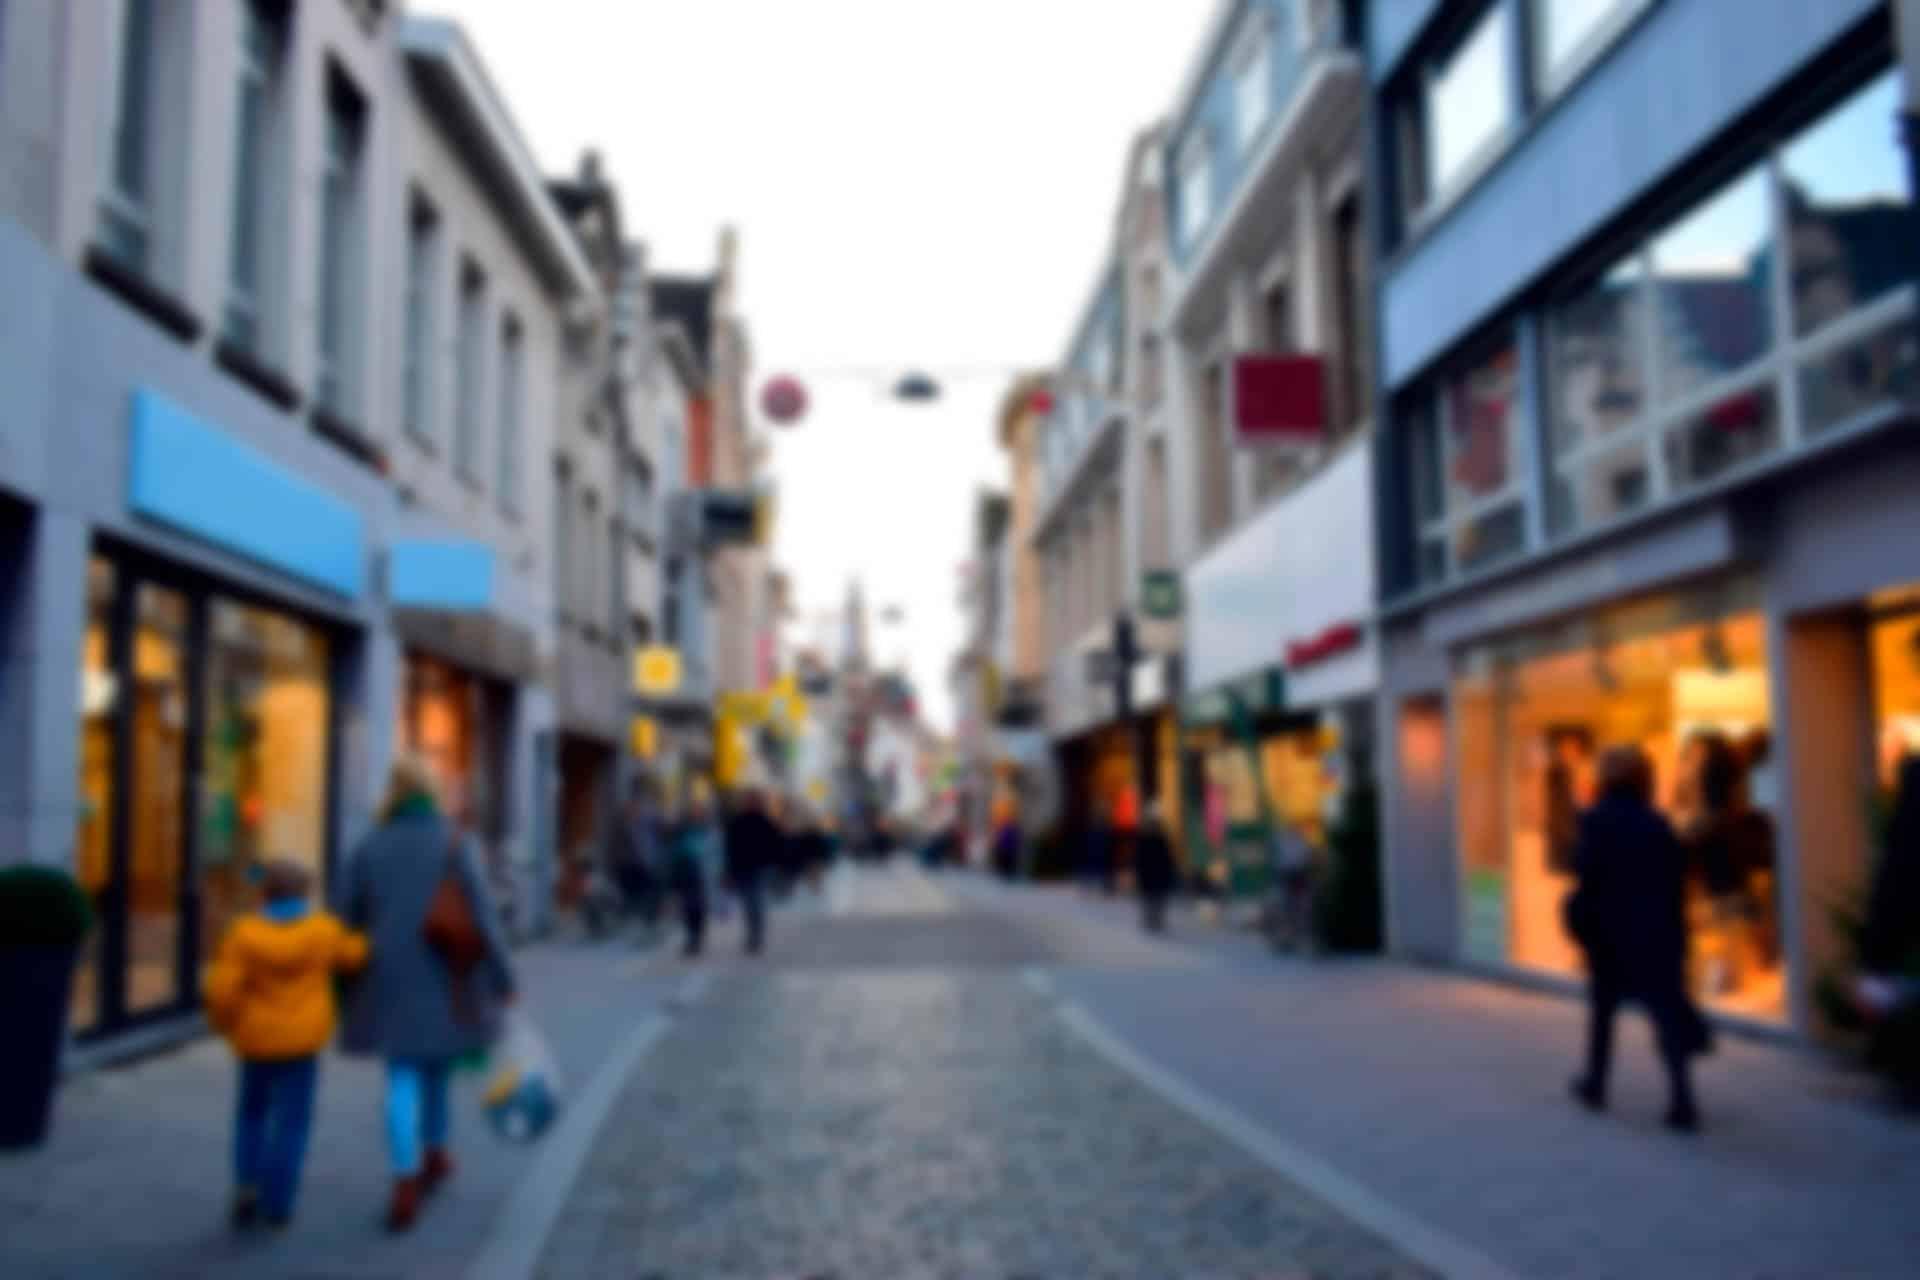 Blurred Pedestrians Walk In A Shopping District